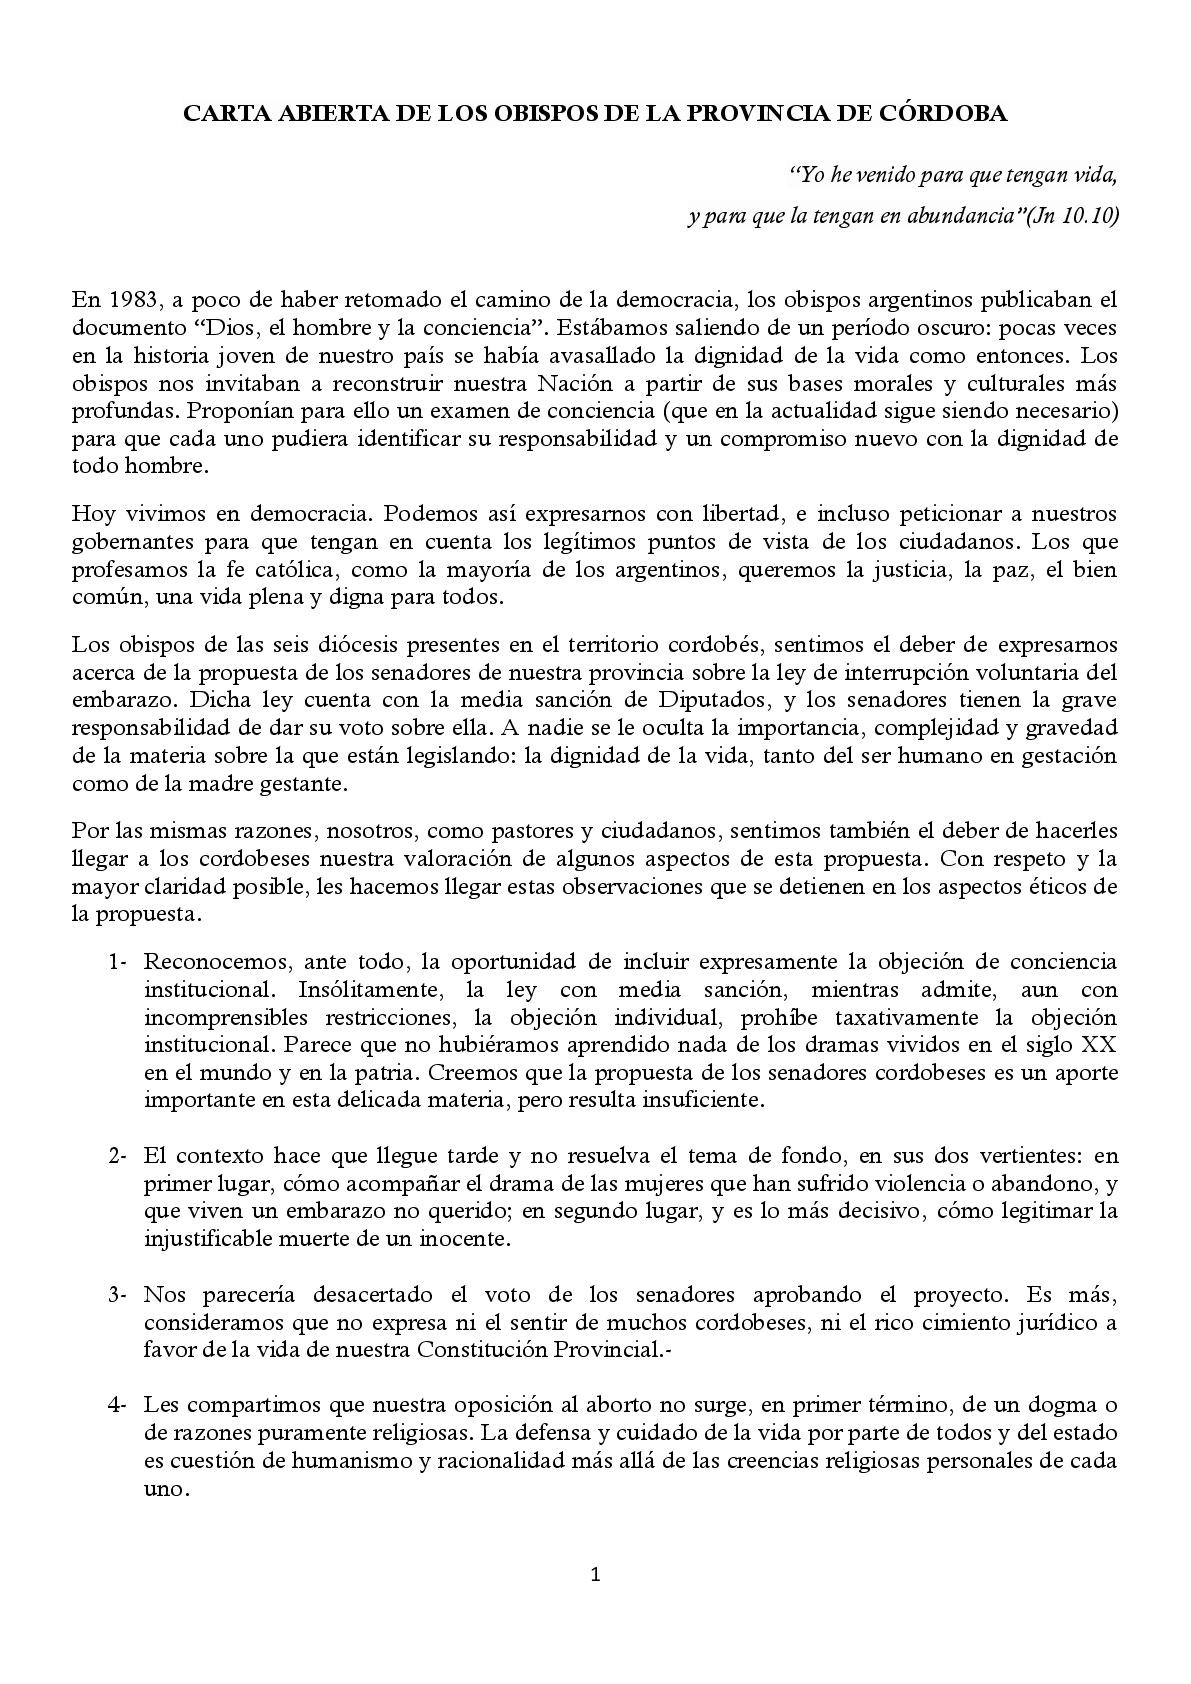 Carta de Obispos de Córdoba contra el aborto • Canal C